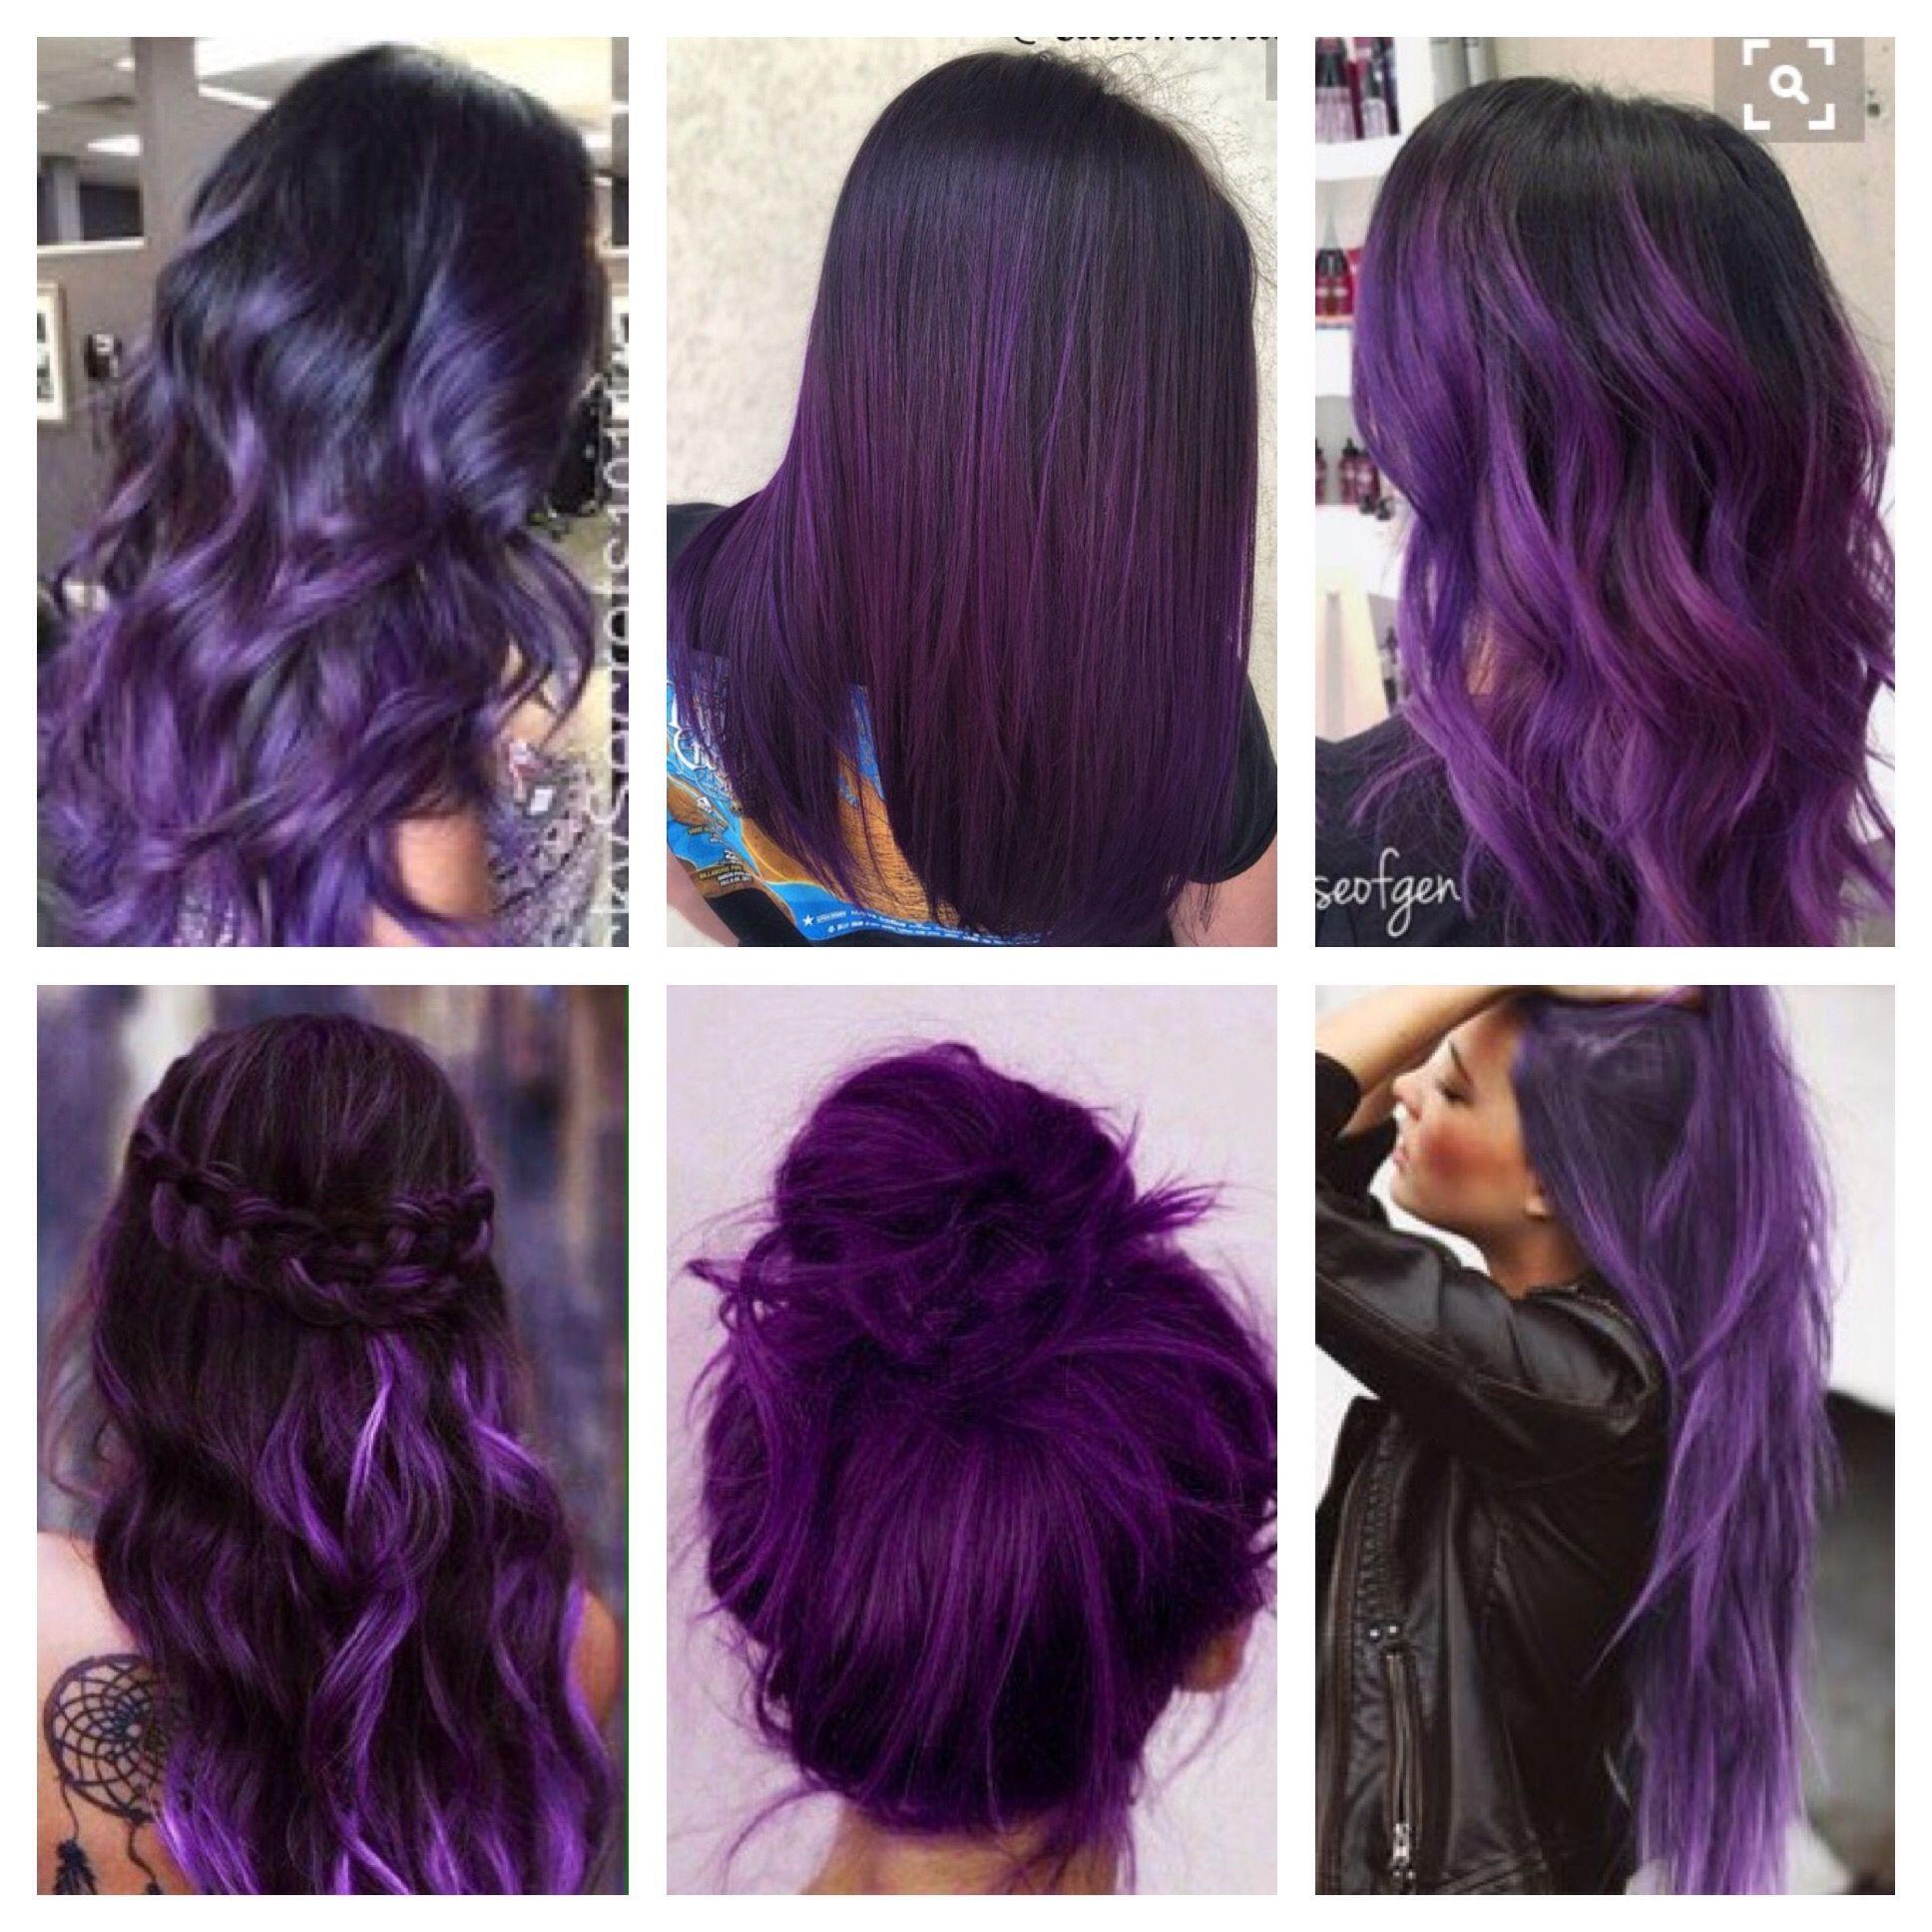 I Want Purple Hair So Bad Hair Styles Cool Hair Color Hair Color Purple